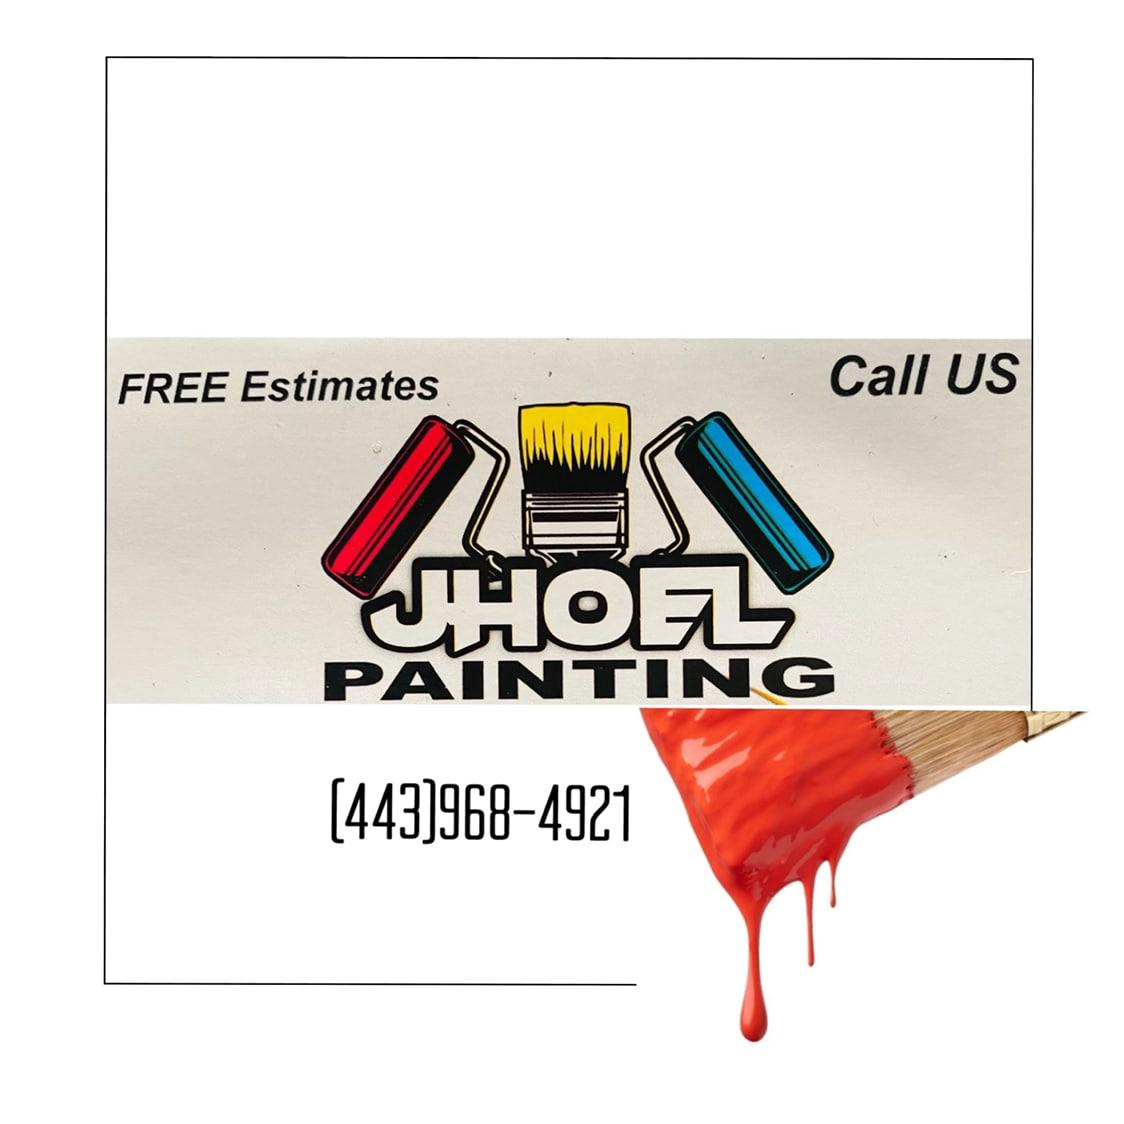 Jhoel Painting logo